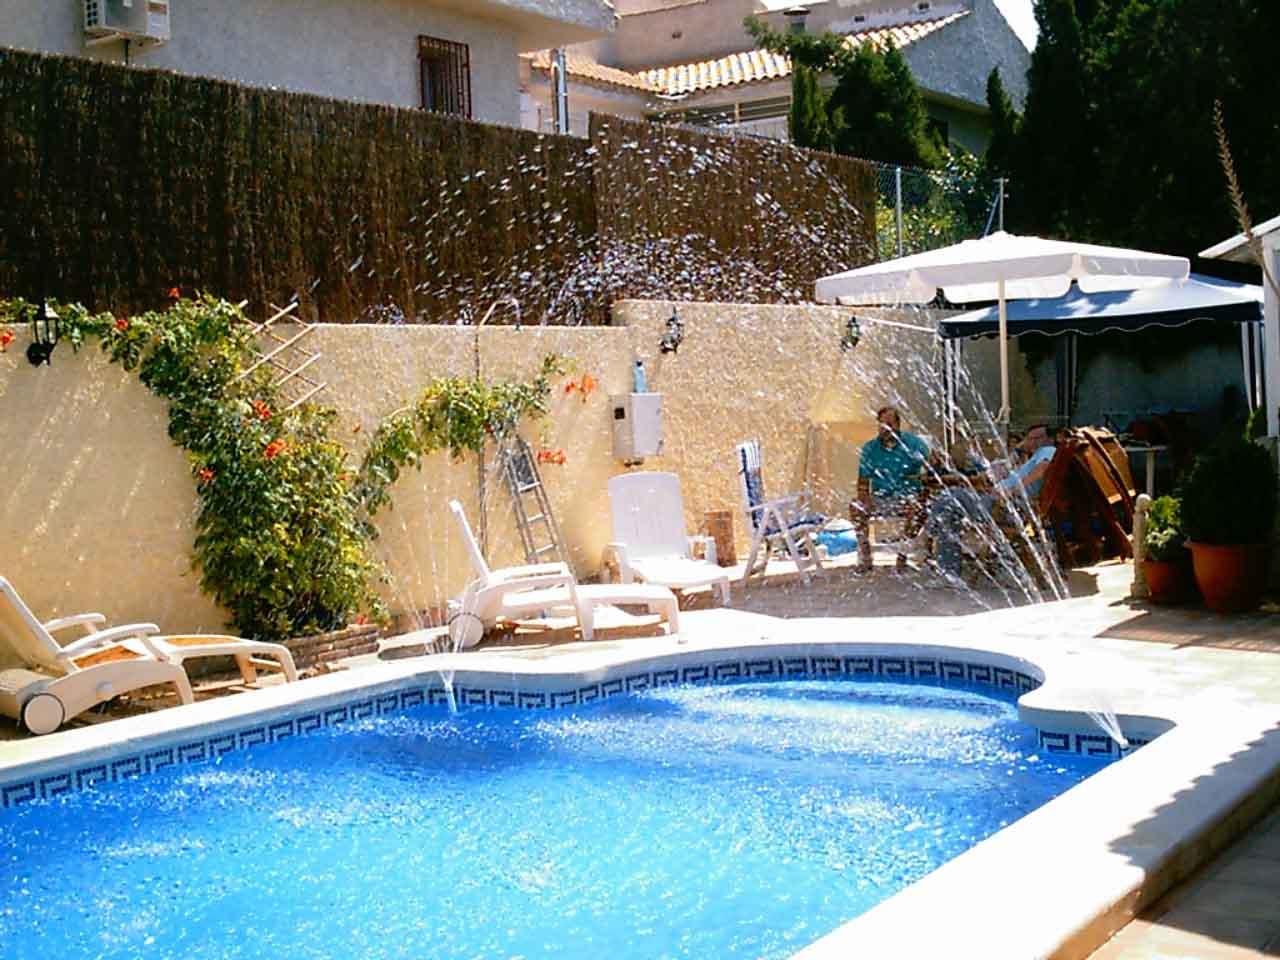 Boquillas para fuentes mayo 2015 for Chorros para piscinas